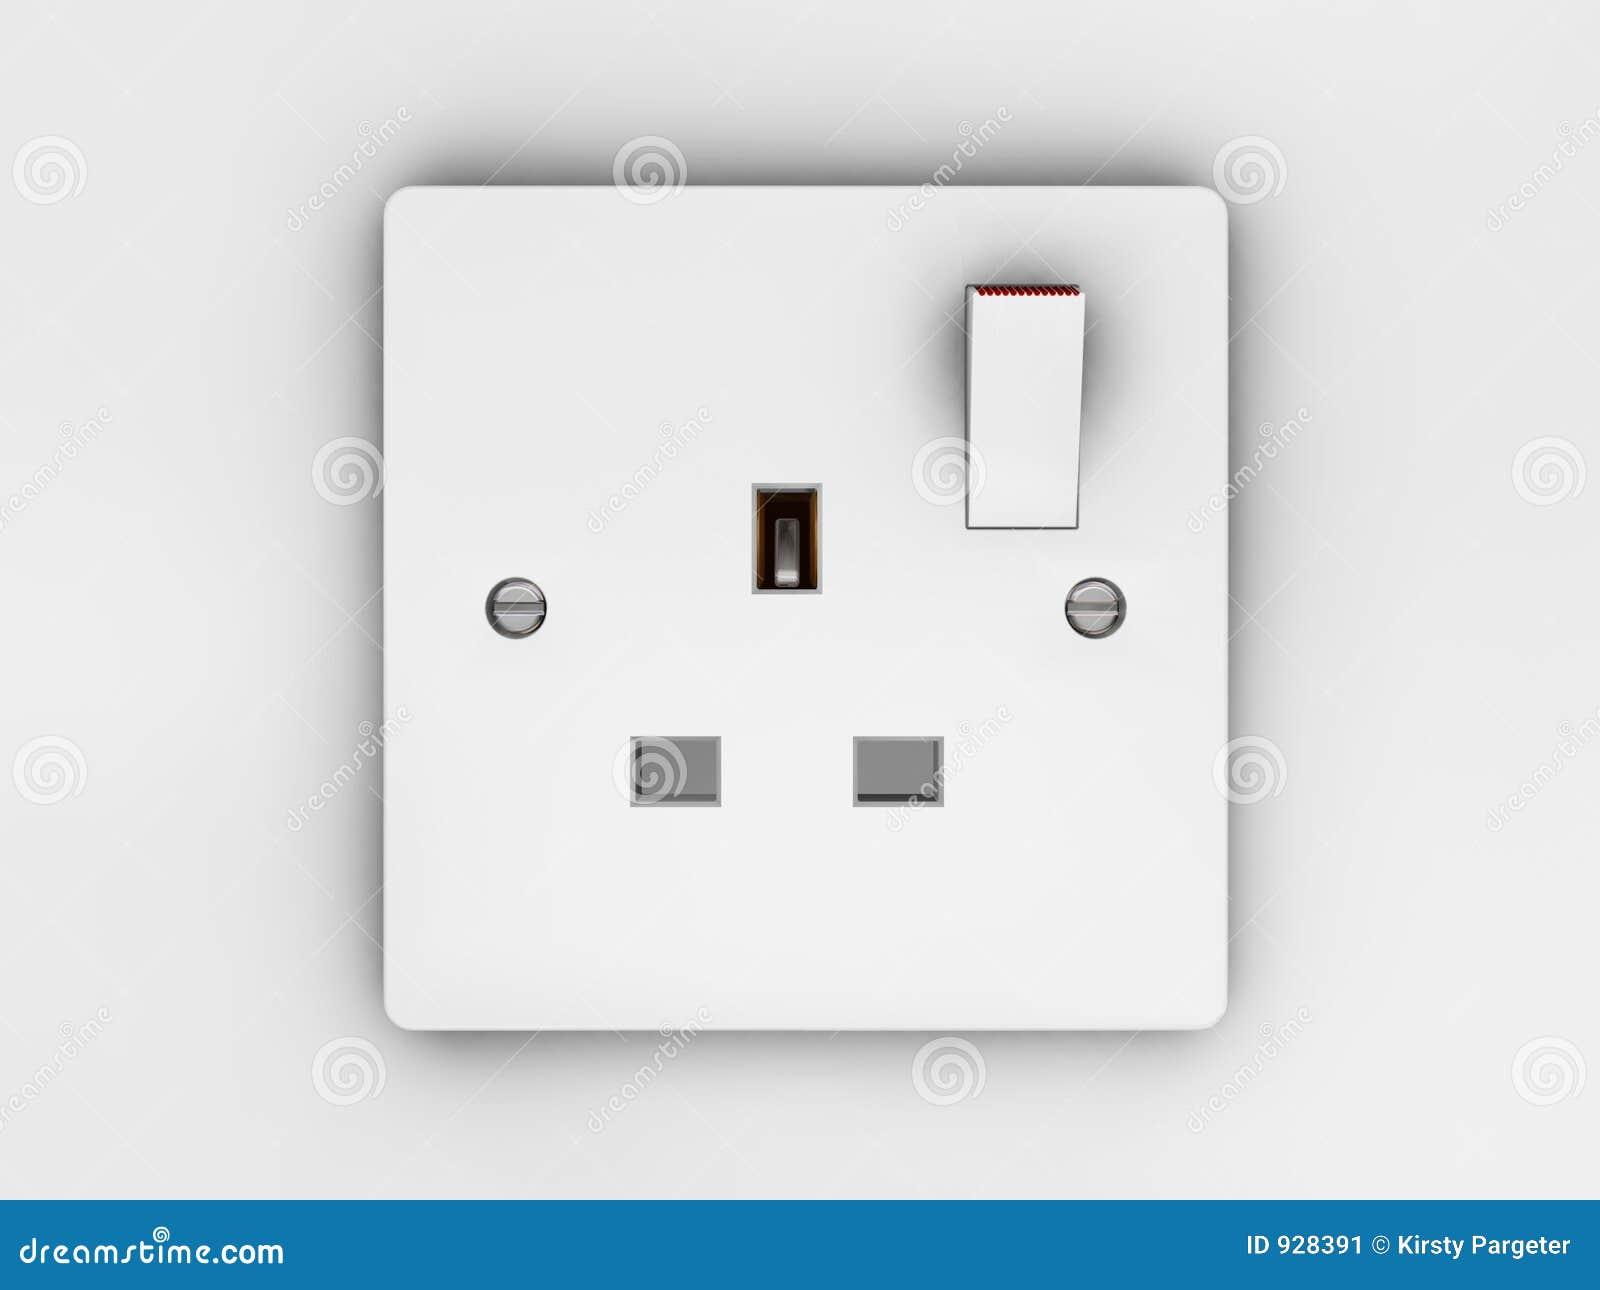 Plug socket stock image image 928391